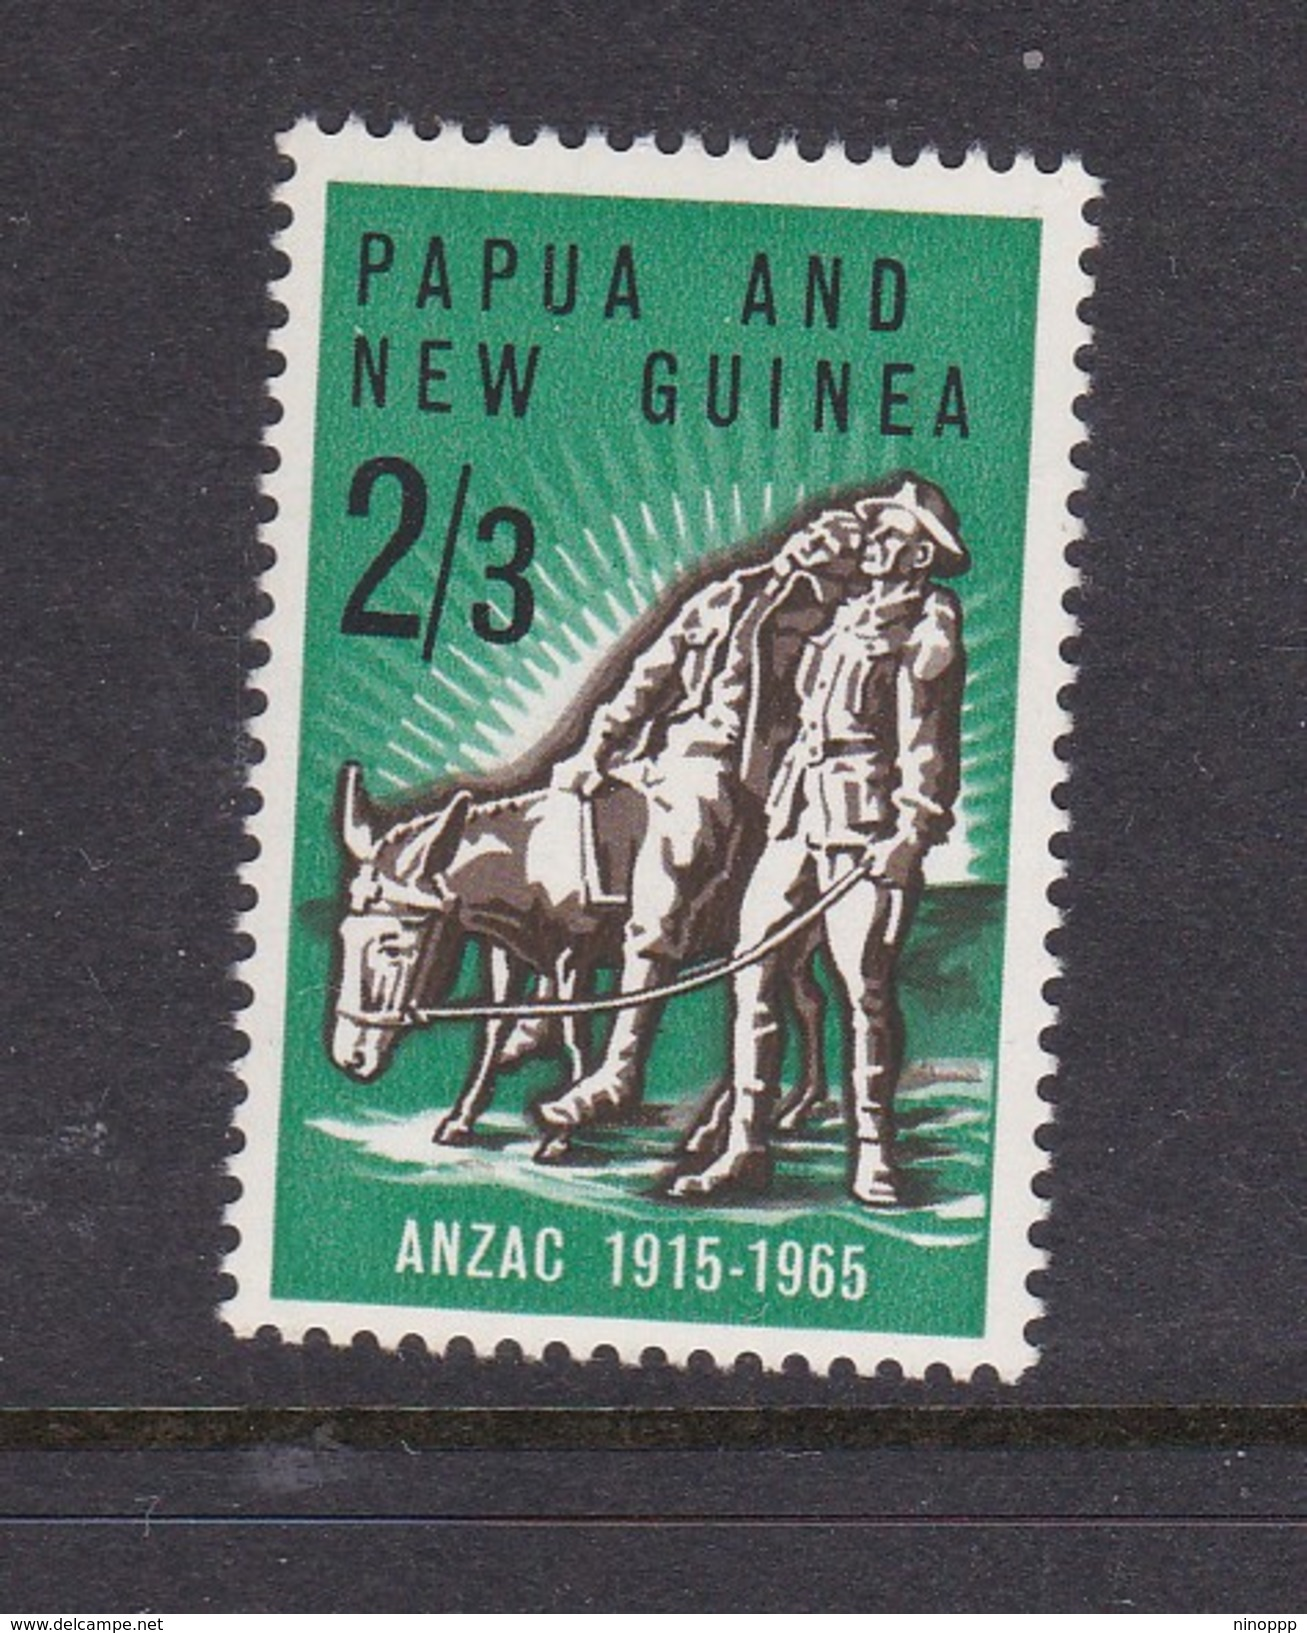 Papua New Guinea SG 76 1965 50th Anniversary Of Gallipoli Landing Mint Never Hinged - Papoea-Nieuw-Guinea